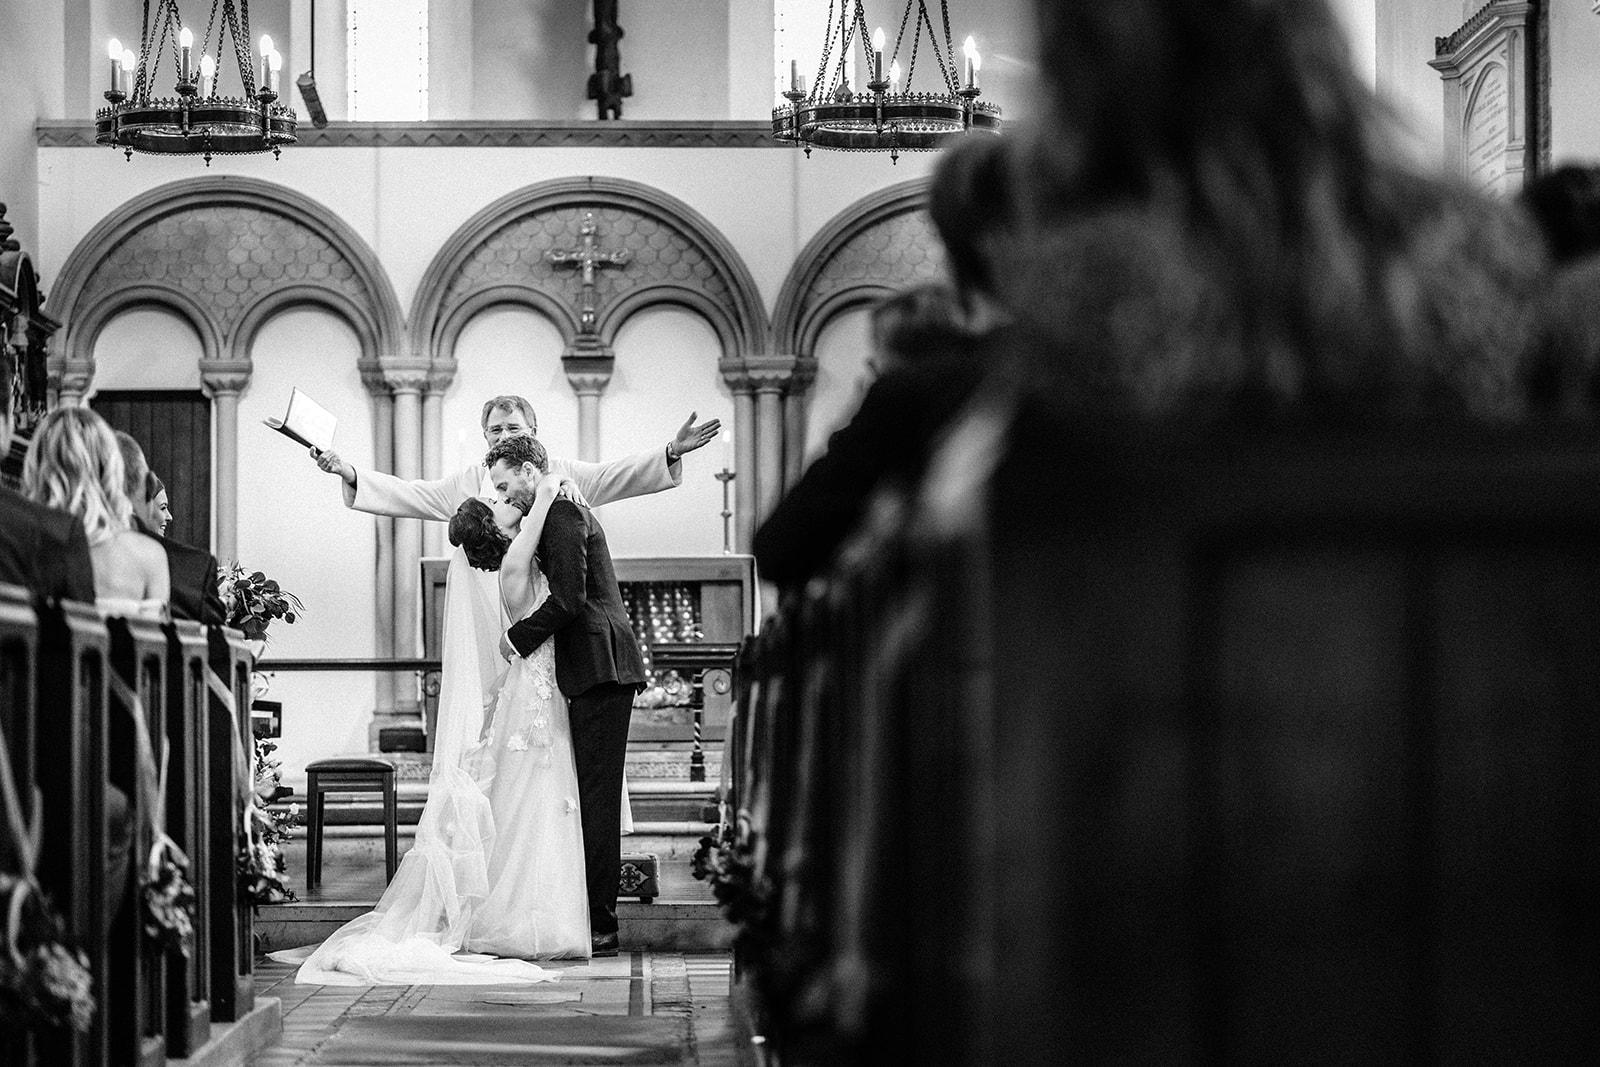 the-olde-bell-wedding-photography-jade-jonnie-176.jpg